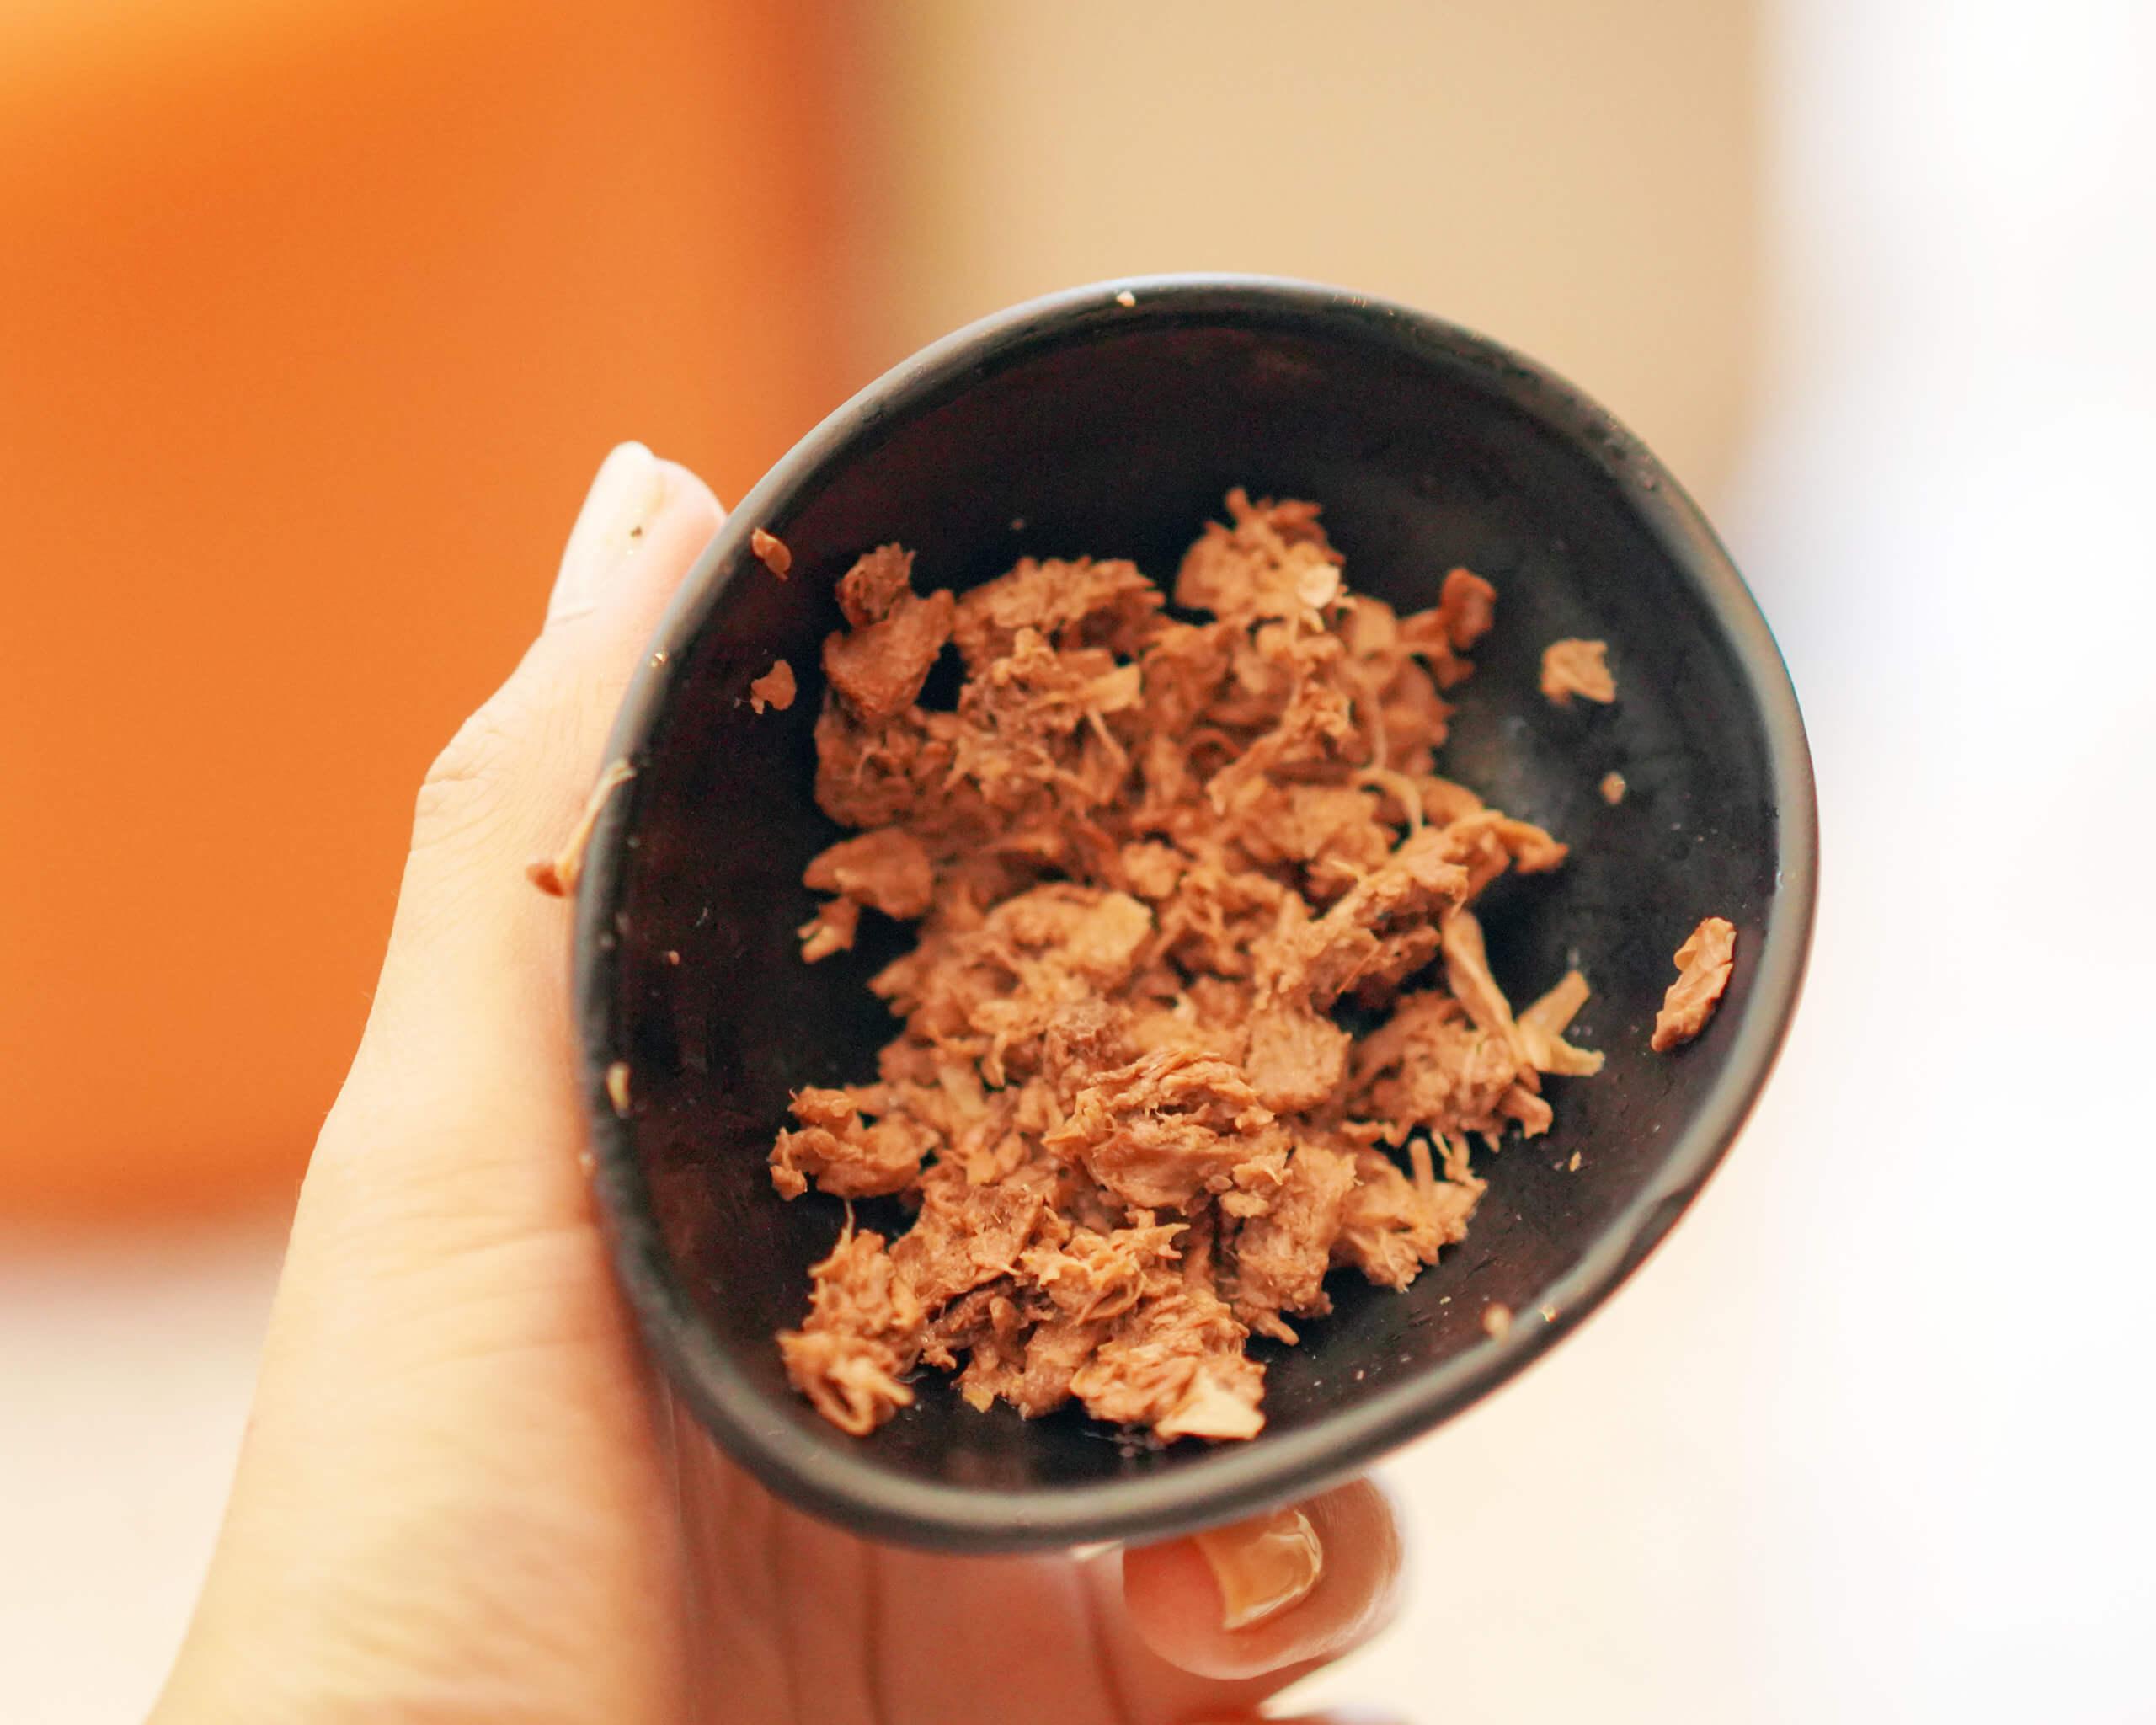 KARANA將大樹菠蘿果衣加工,製成質感與碎豬肉相似嘅素肉新品。